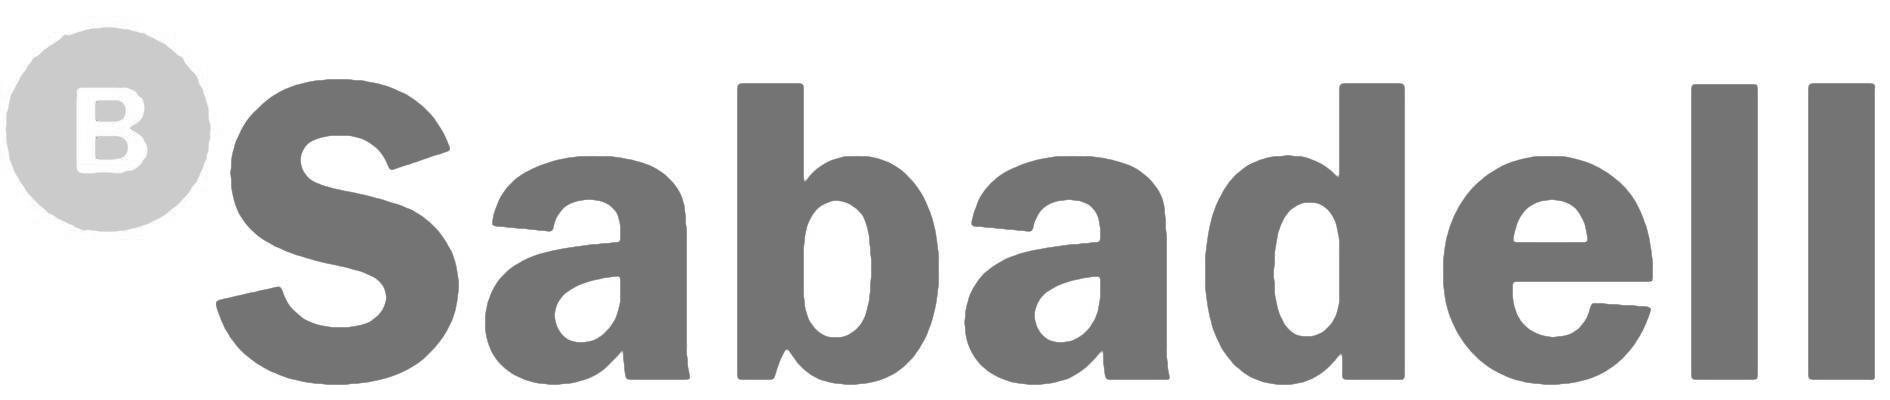 Banco Sabadell iomando